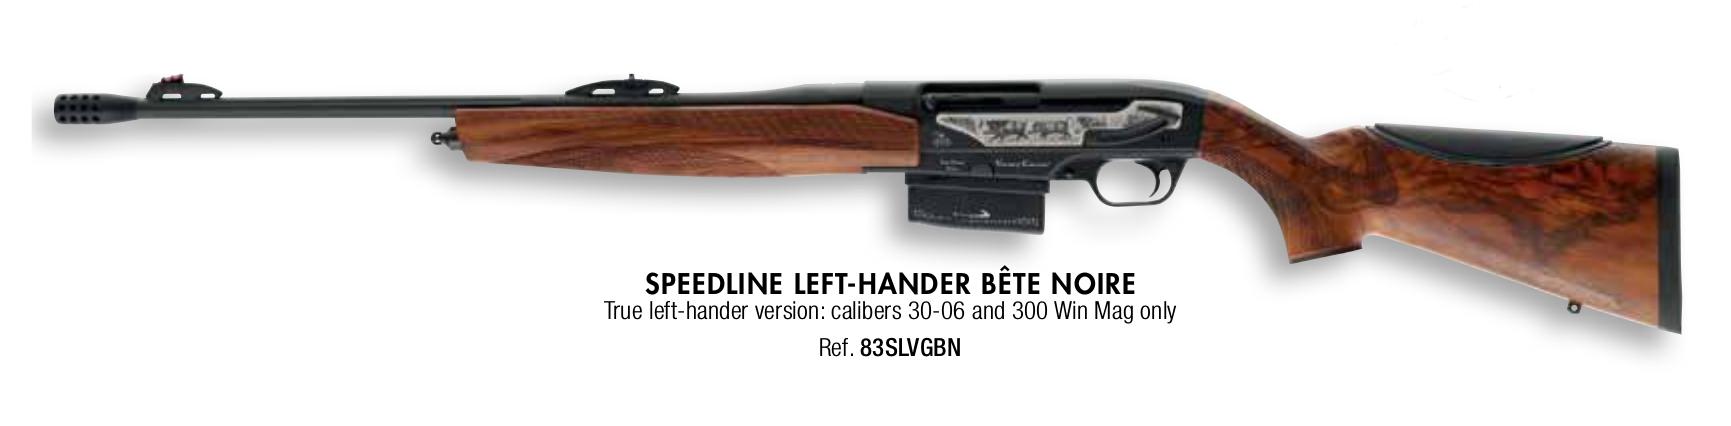 Verney-Carron Speedline Bête Noire left handed rifle